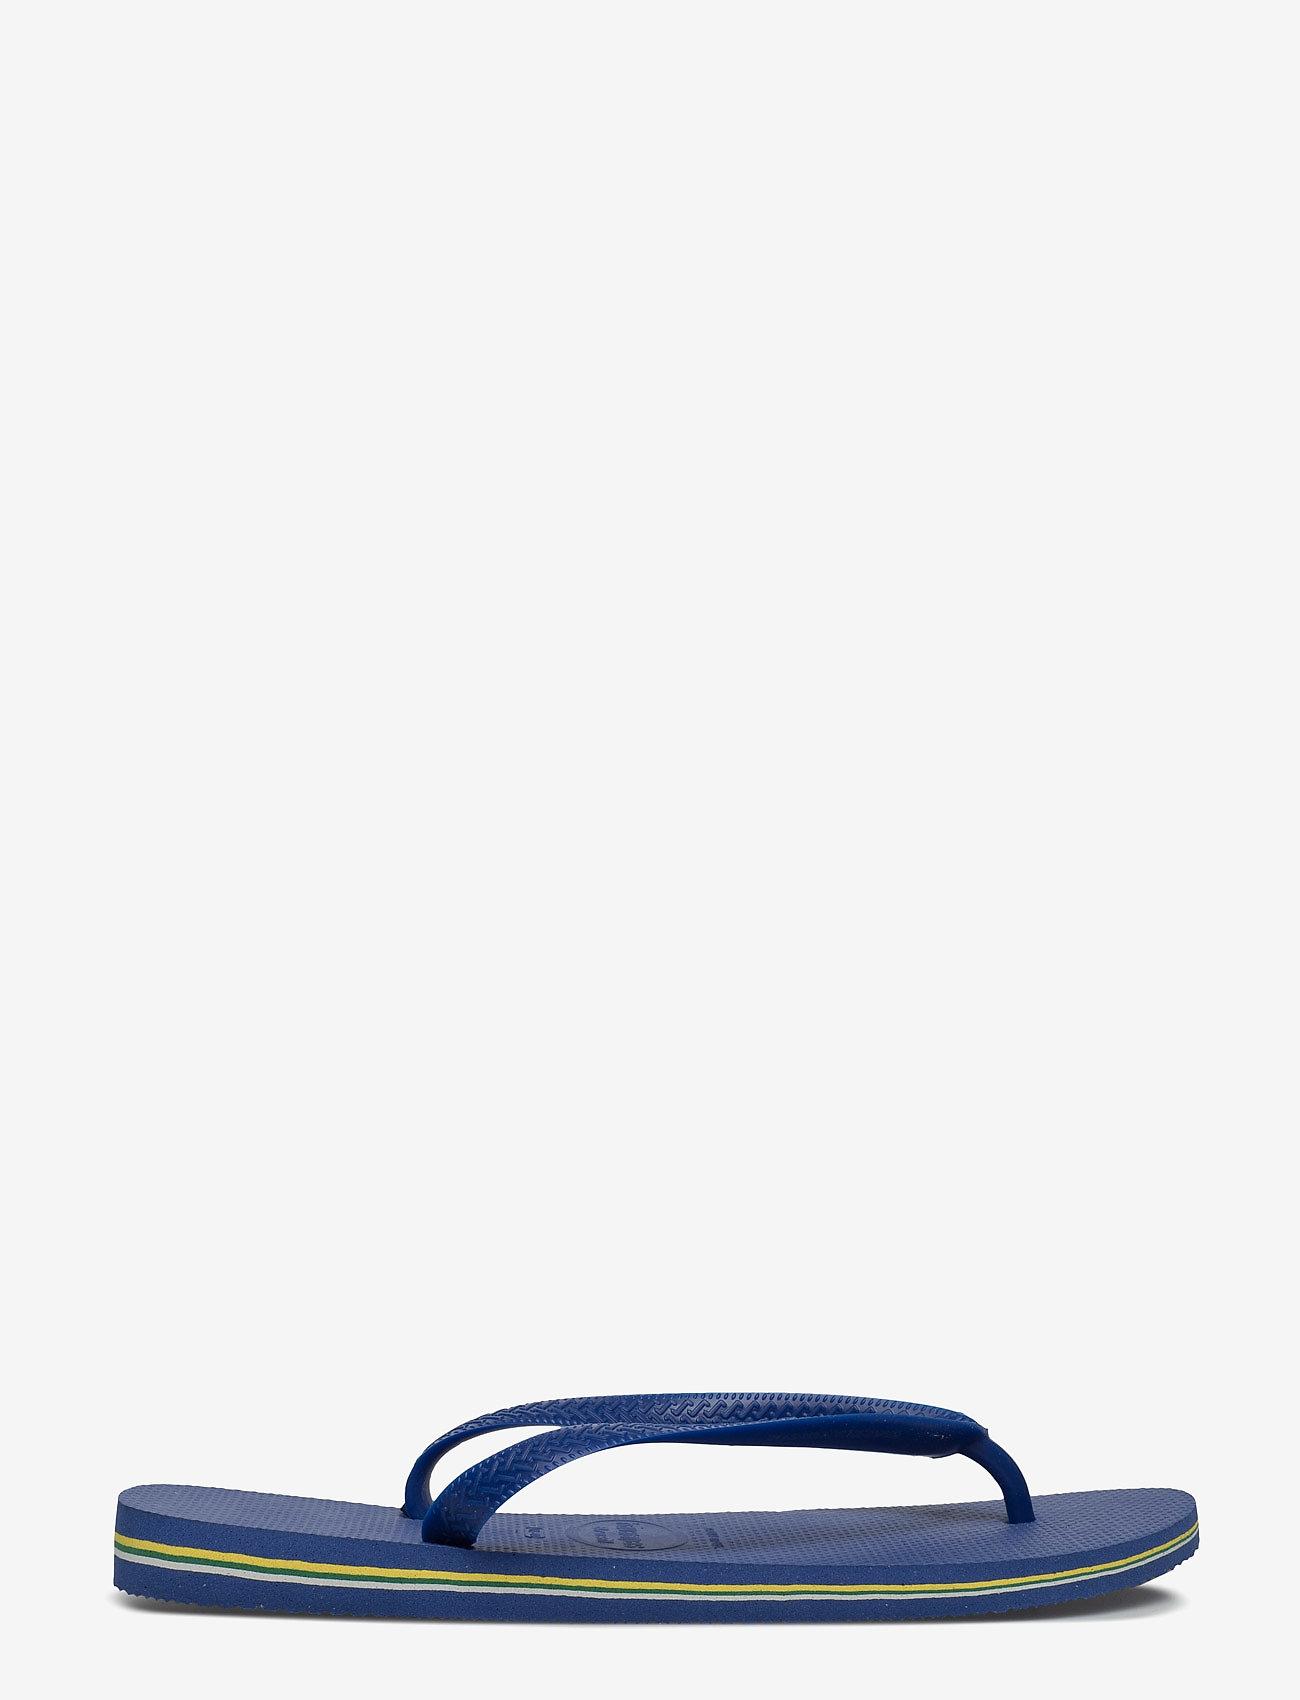 Havaianas - Brasil - teen slippers - 2711 marine blue - 1